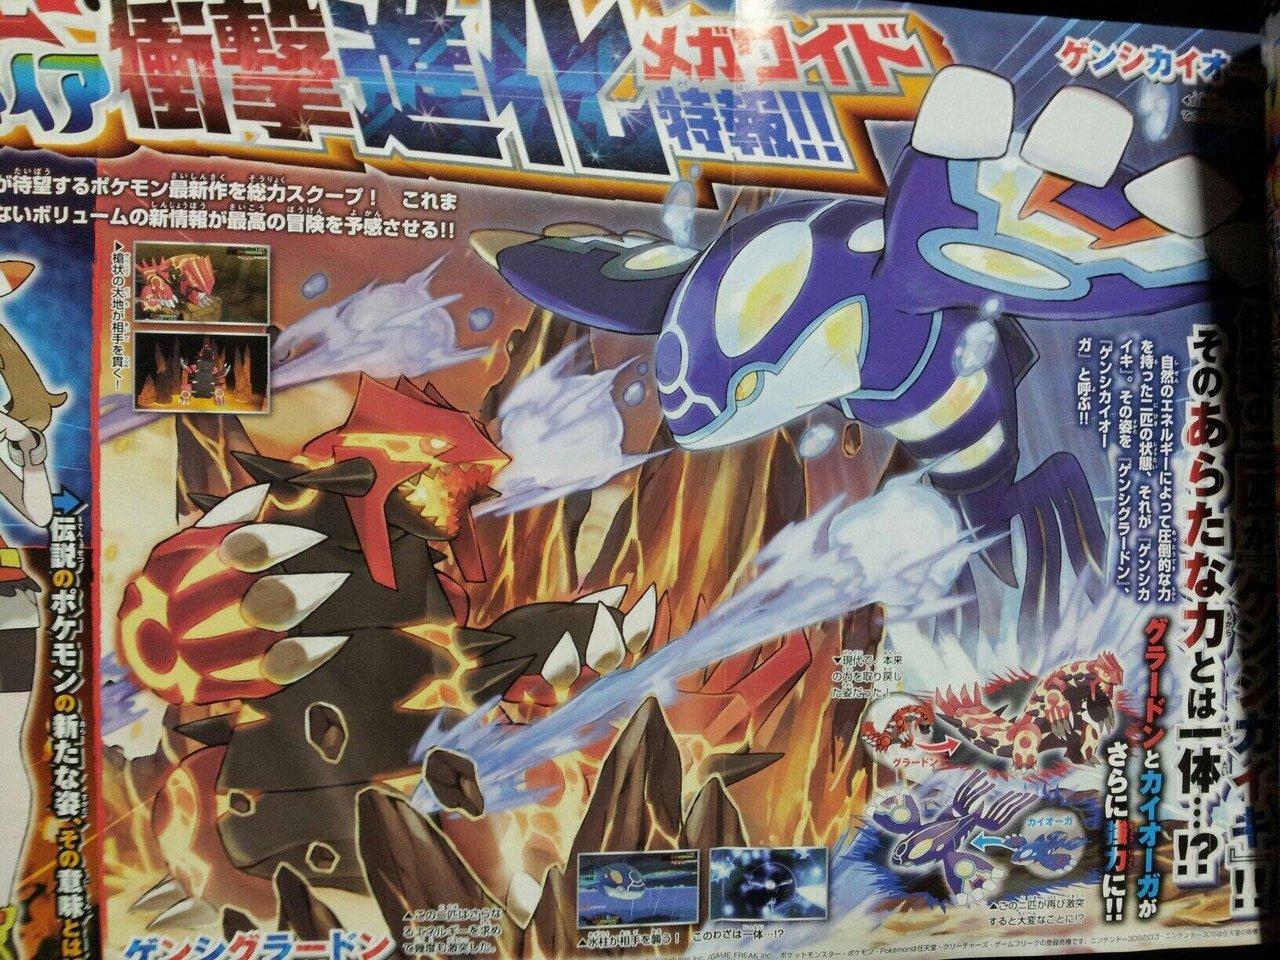 Pokémon Rubí Omega y Pokémon Zafiro Alfa 07-06-14 CoroCoro Comic 002